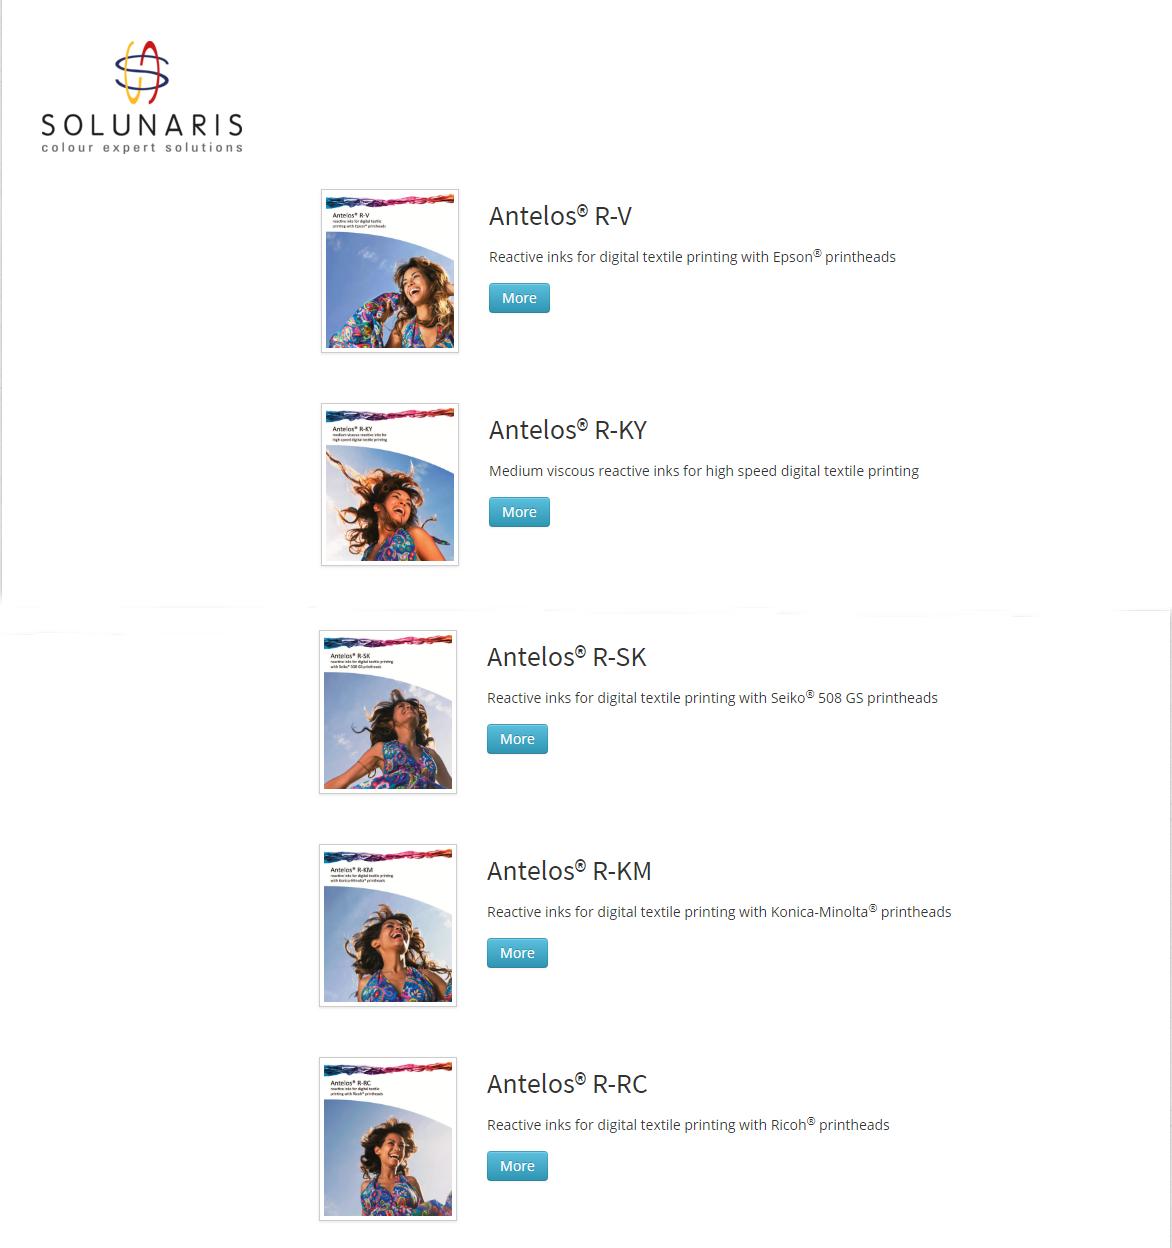 Source Solunaris Reactive Inks Antelos R Km